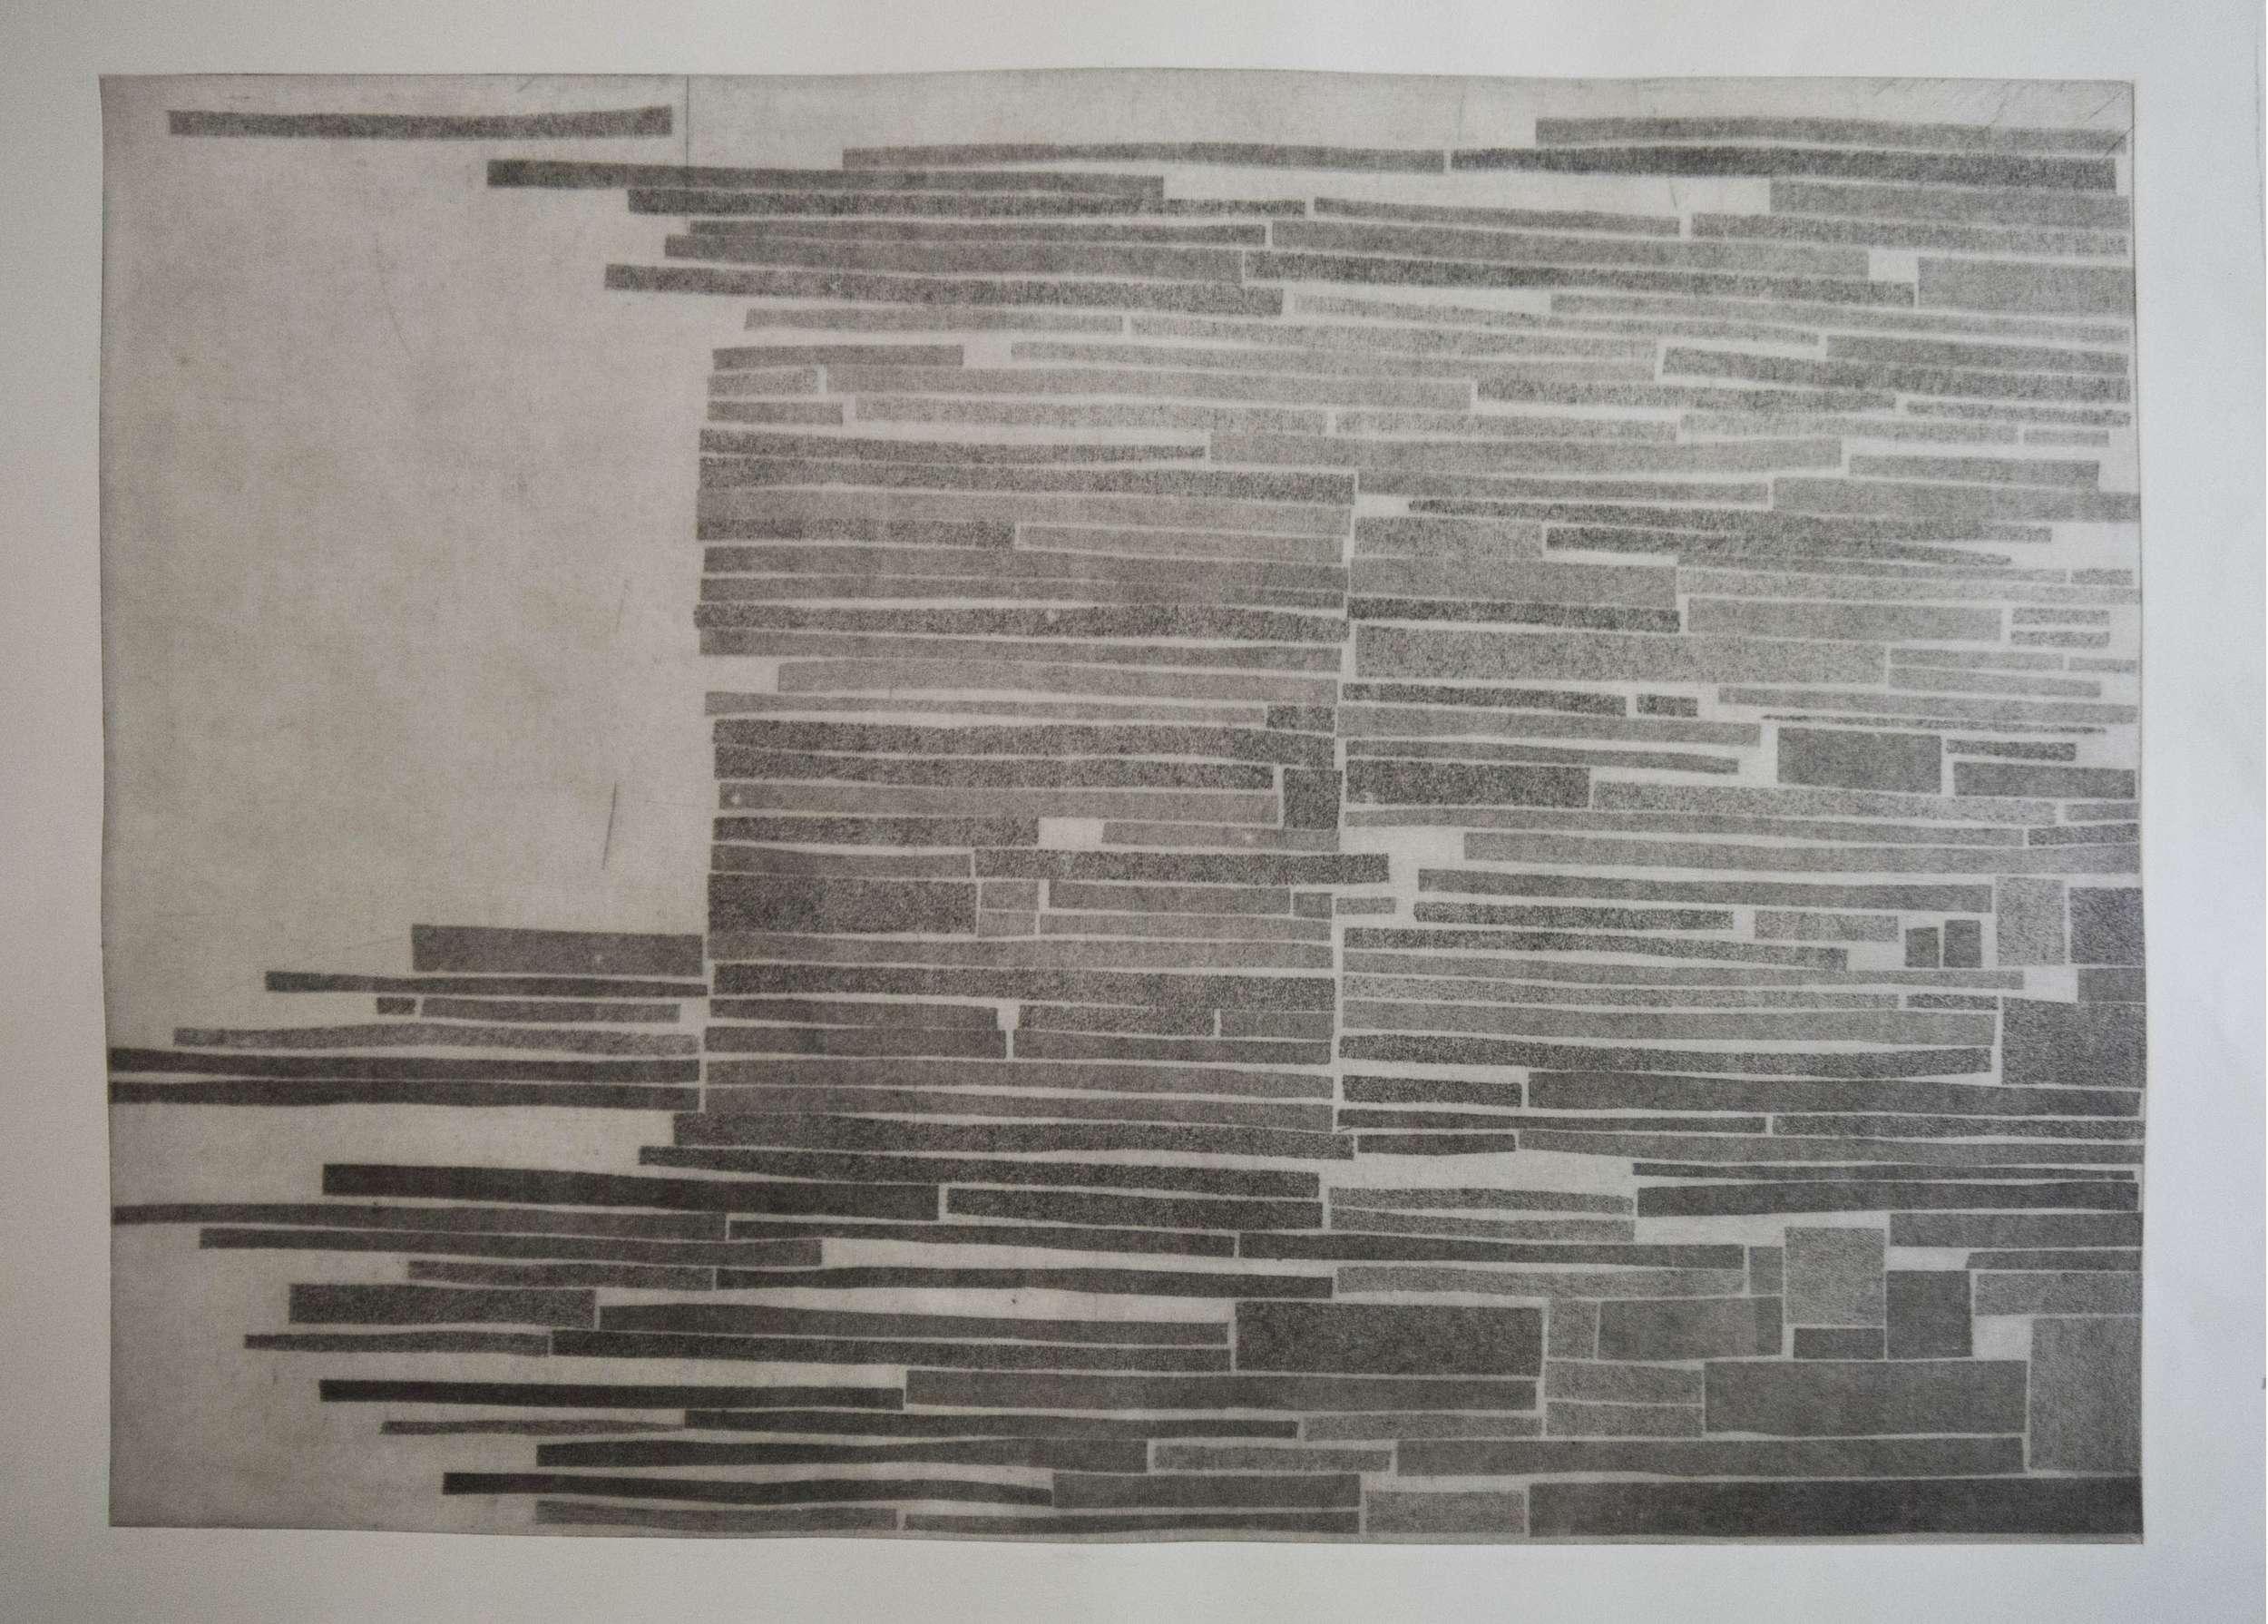 Code 33 BigSandpaperPrintLIGHT Image